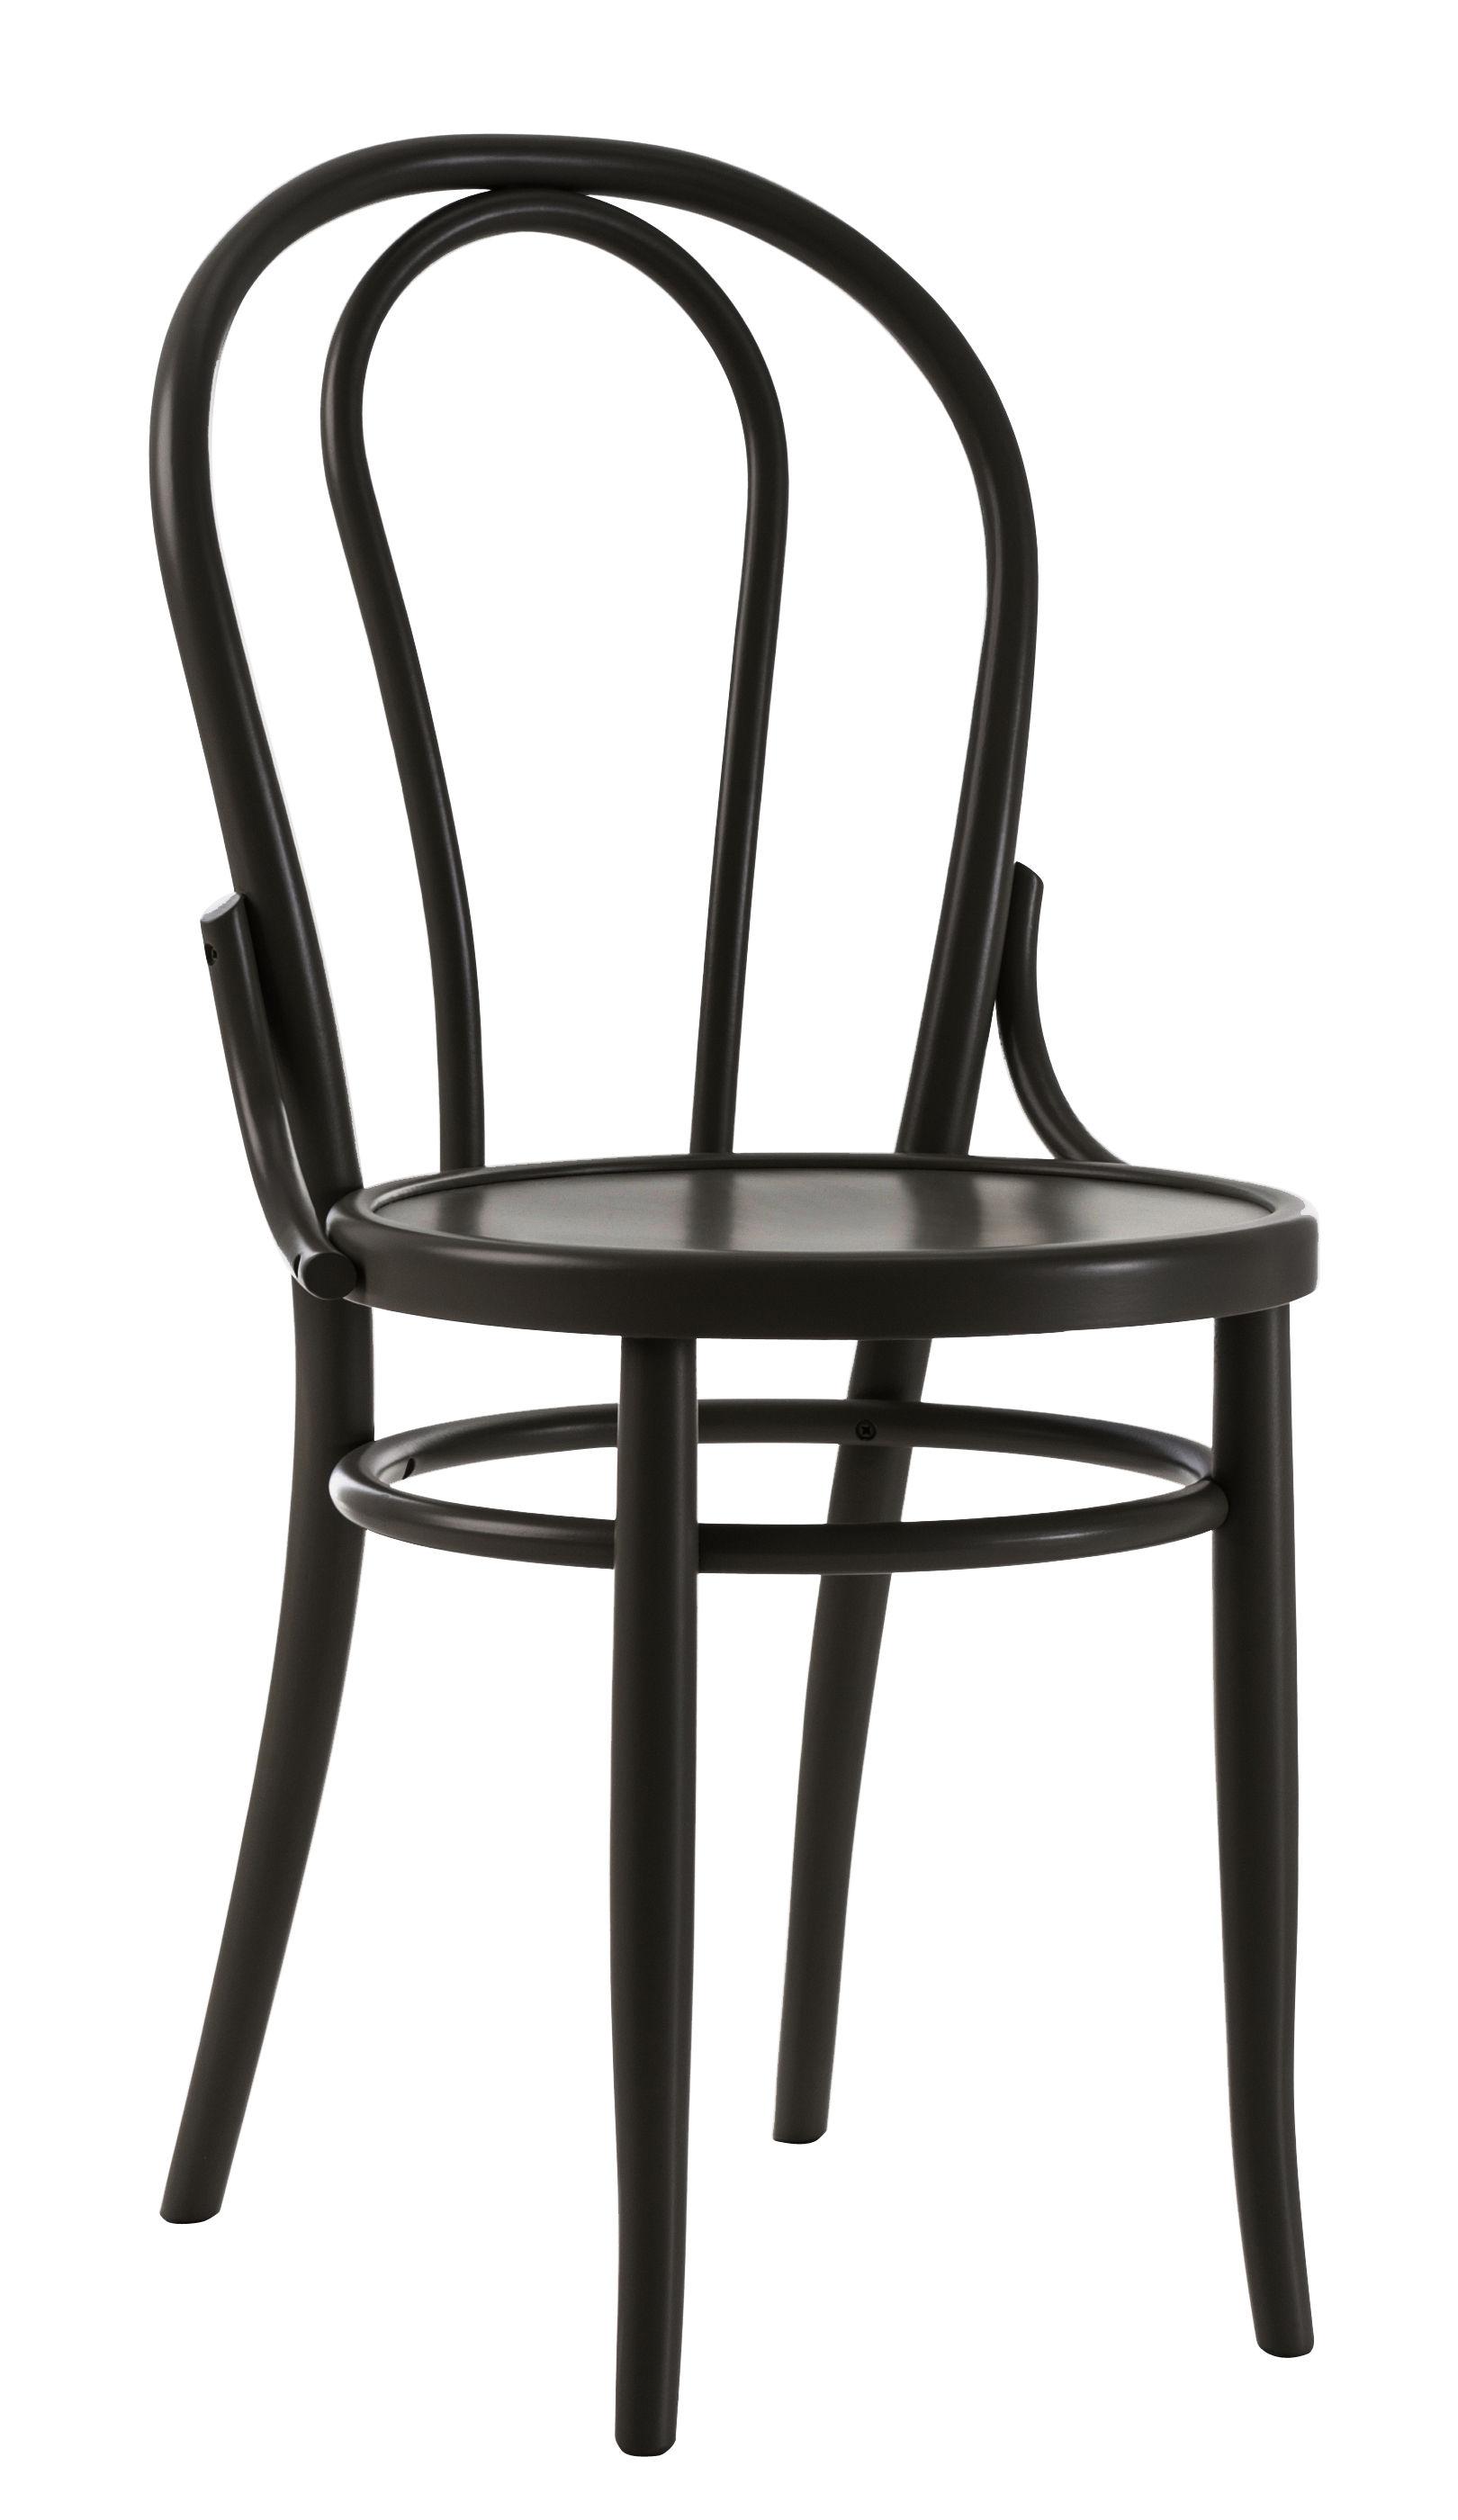 Furniture - Chairs - N° 18 Chair - / 1876 reissue by Wiener GTV Design - Black - Beechwood plywood, Curved solid beechwood